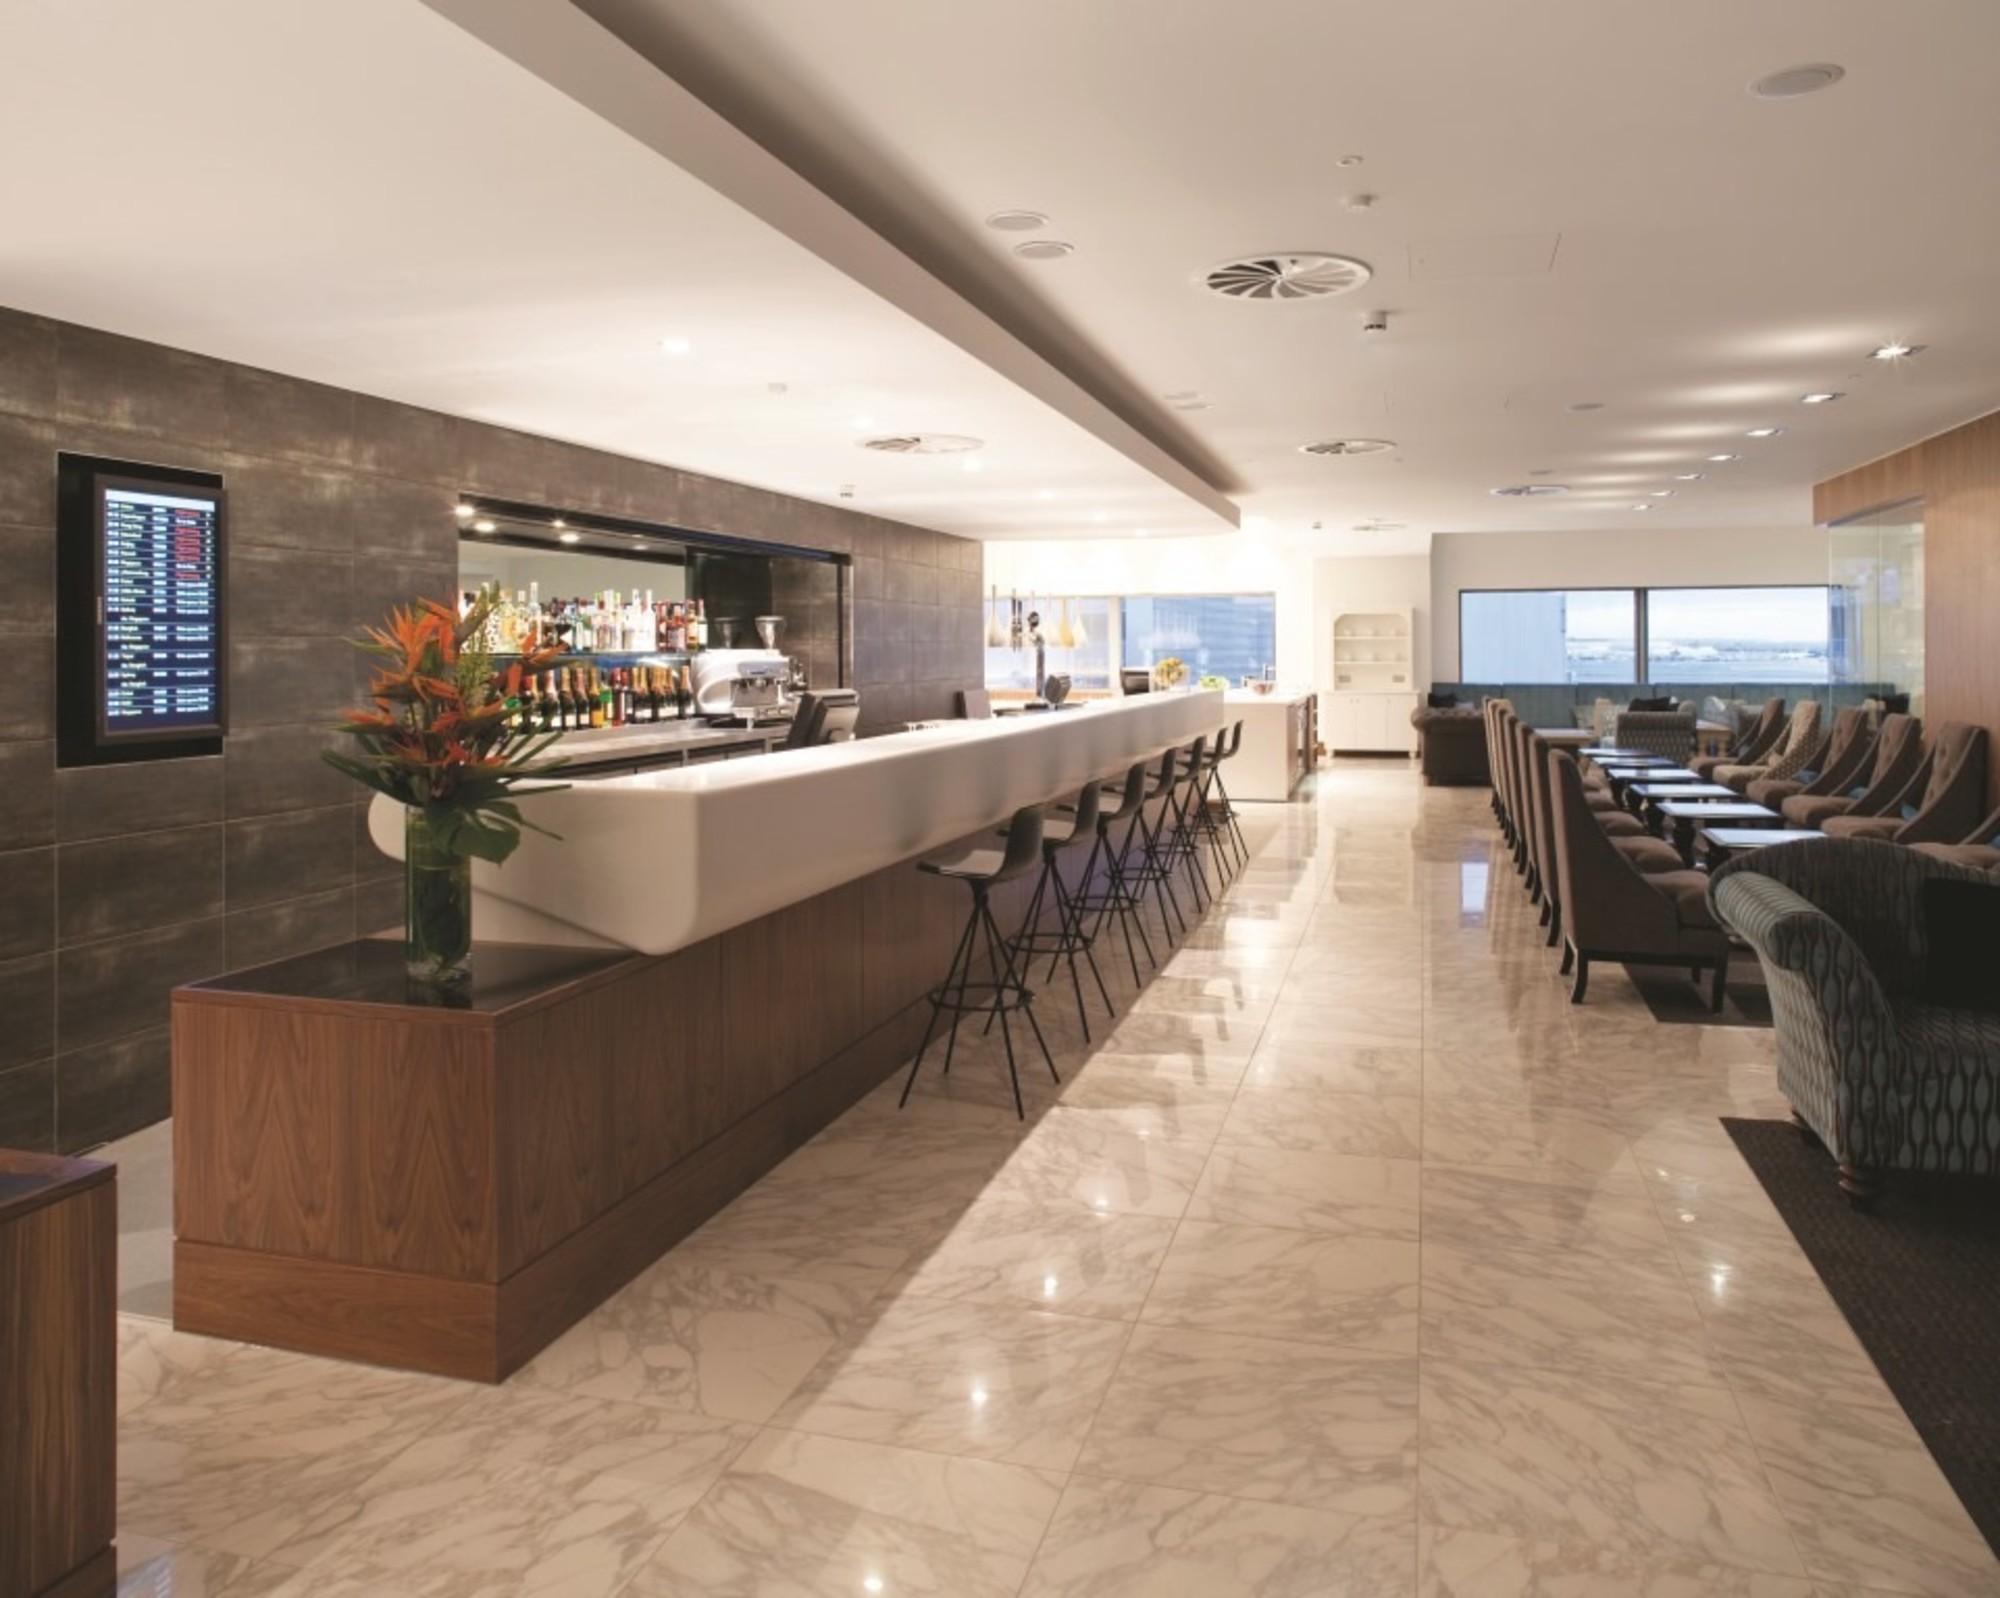 LHR: No1 Lounges, Heathrow Terminal 3 Reviews \u0026 Photos - Terminal ...